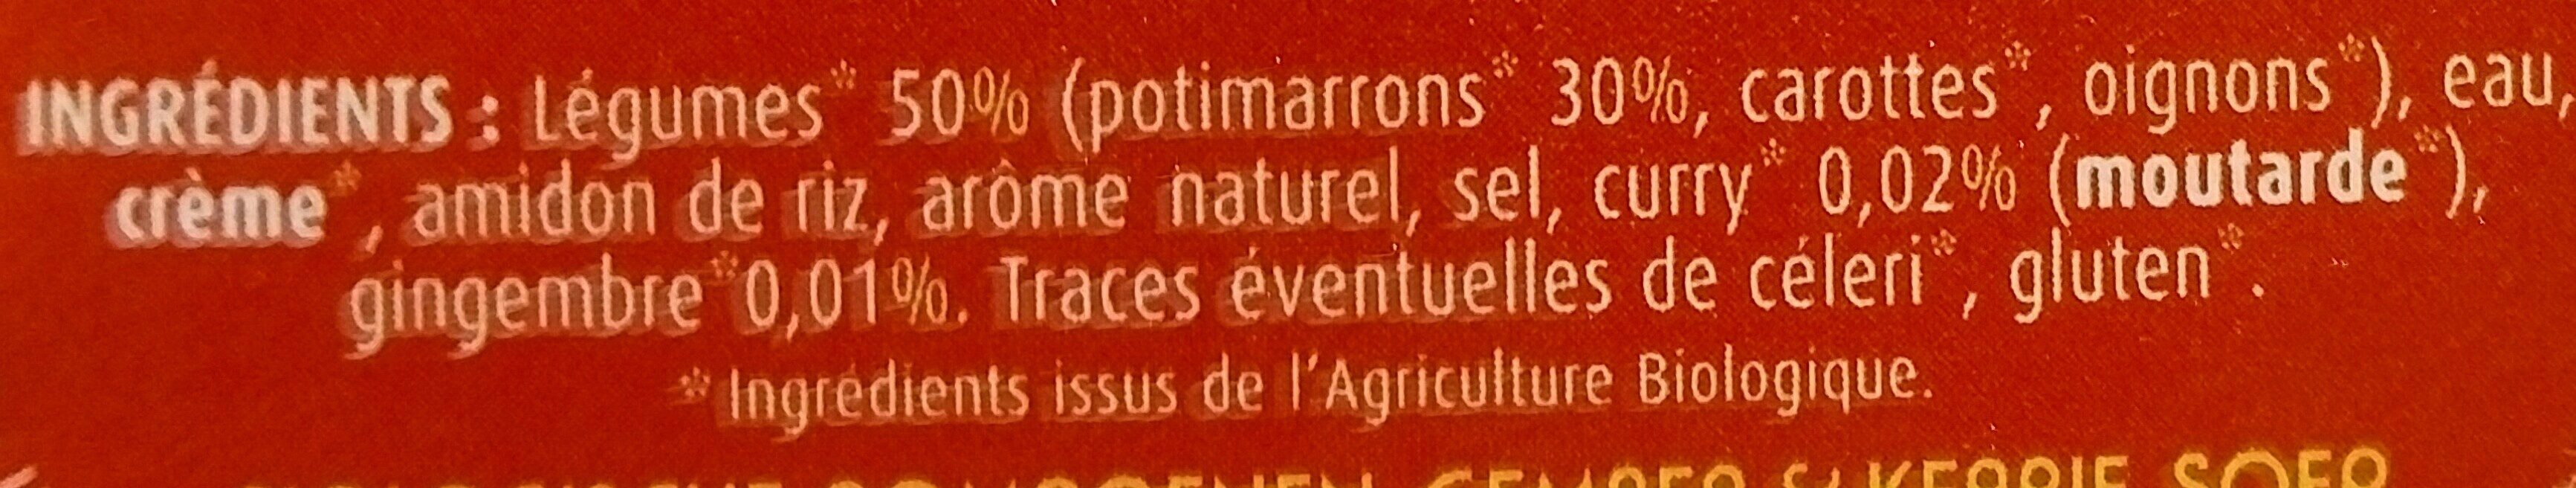 Soupe Potimarron gingembre et curry - Ingrediënten - fr